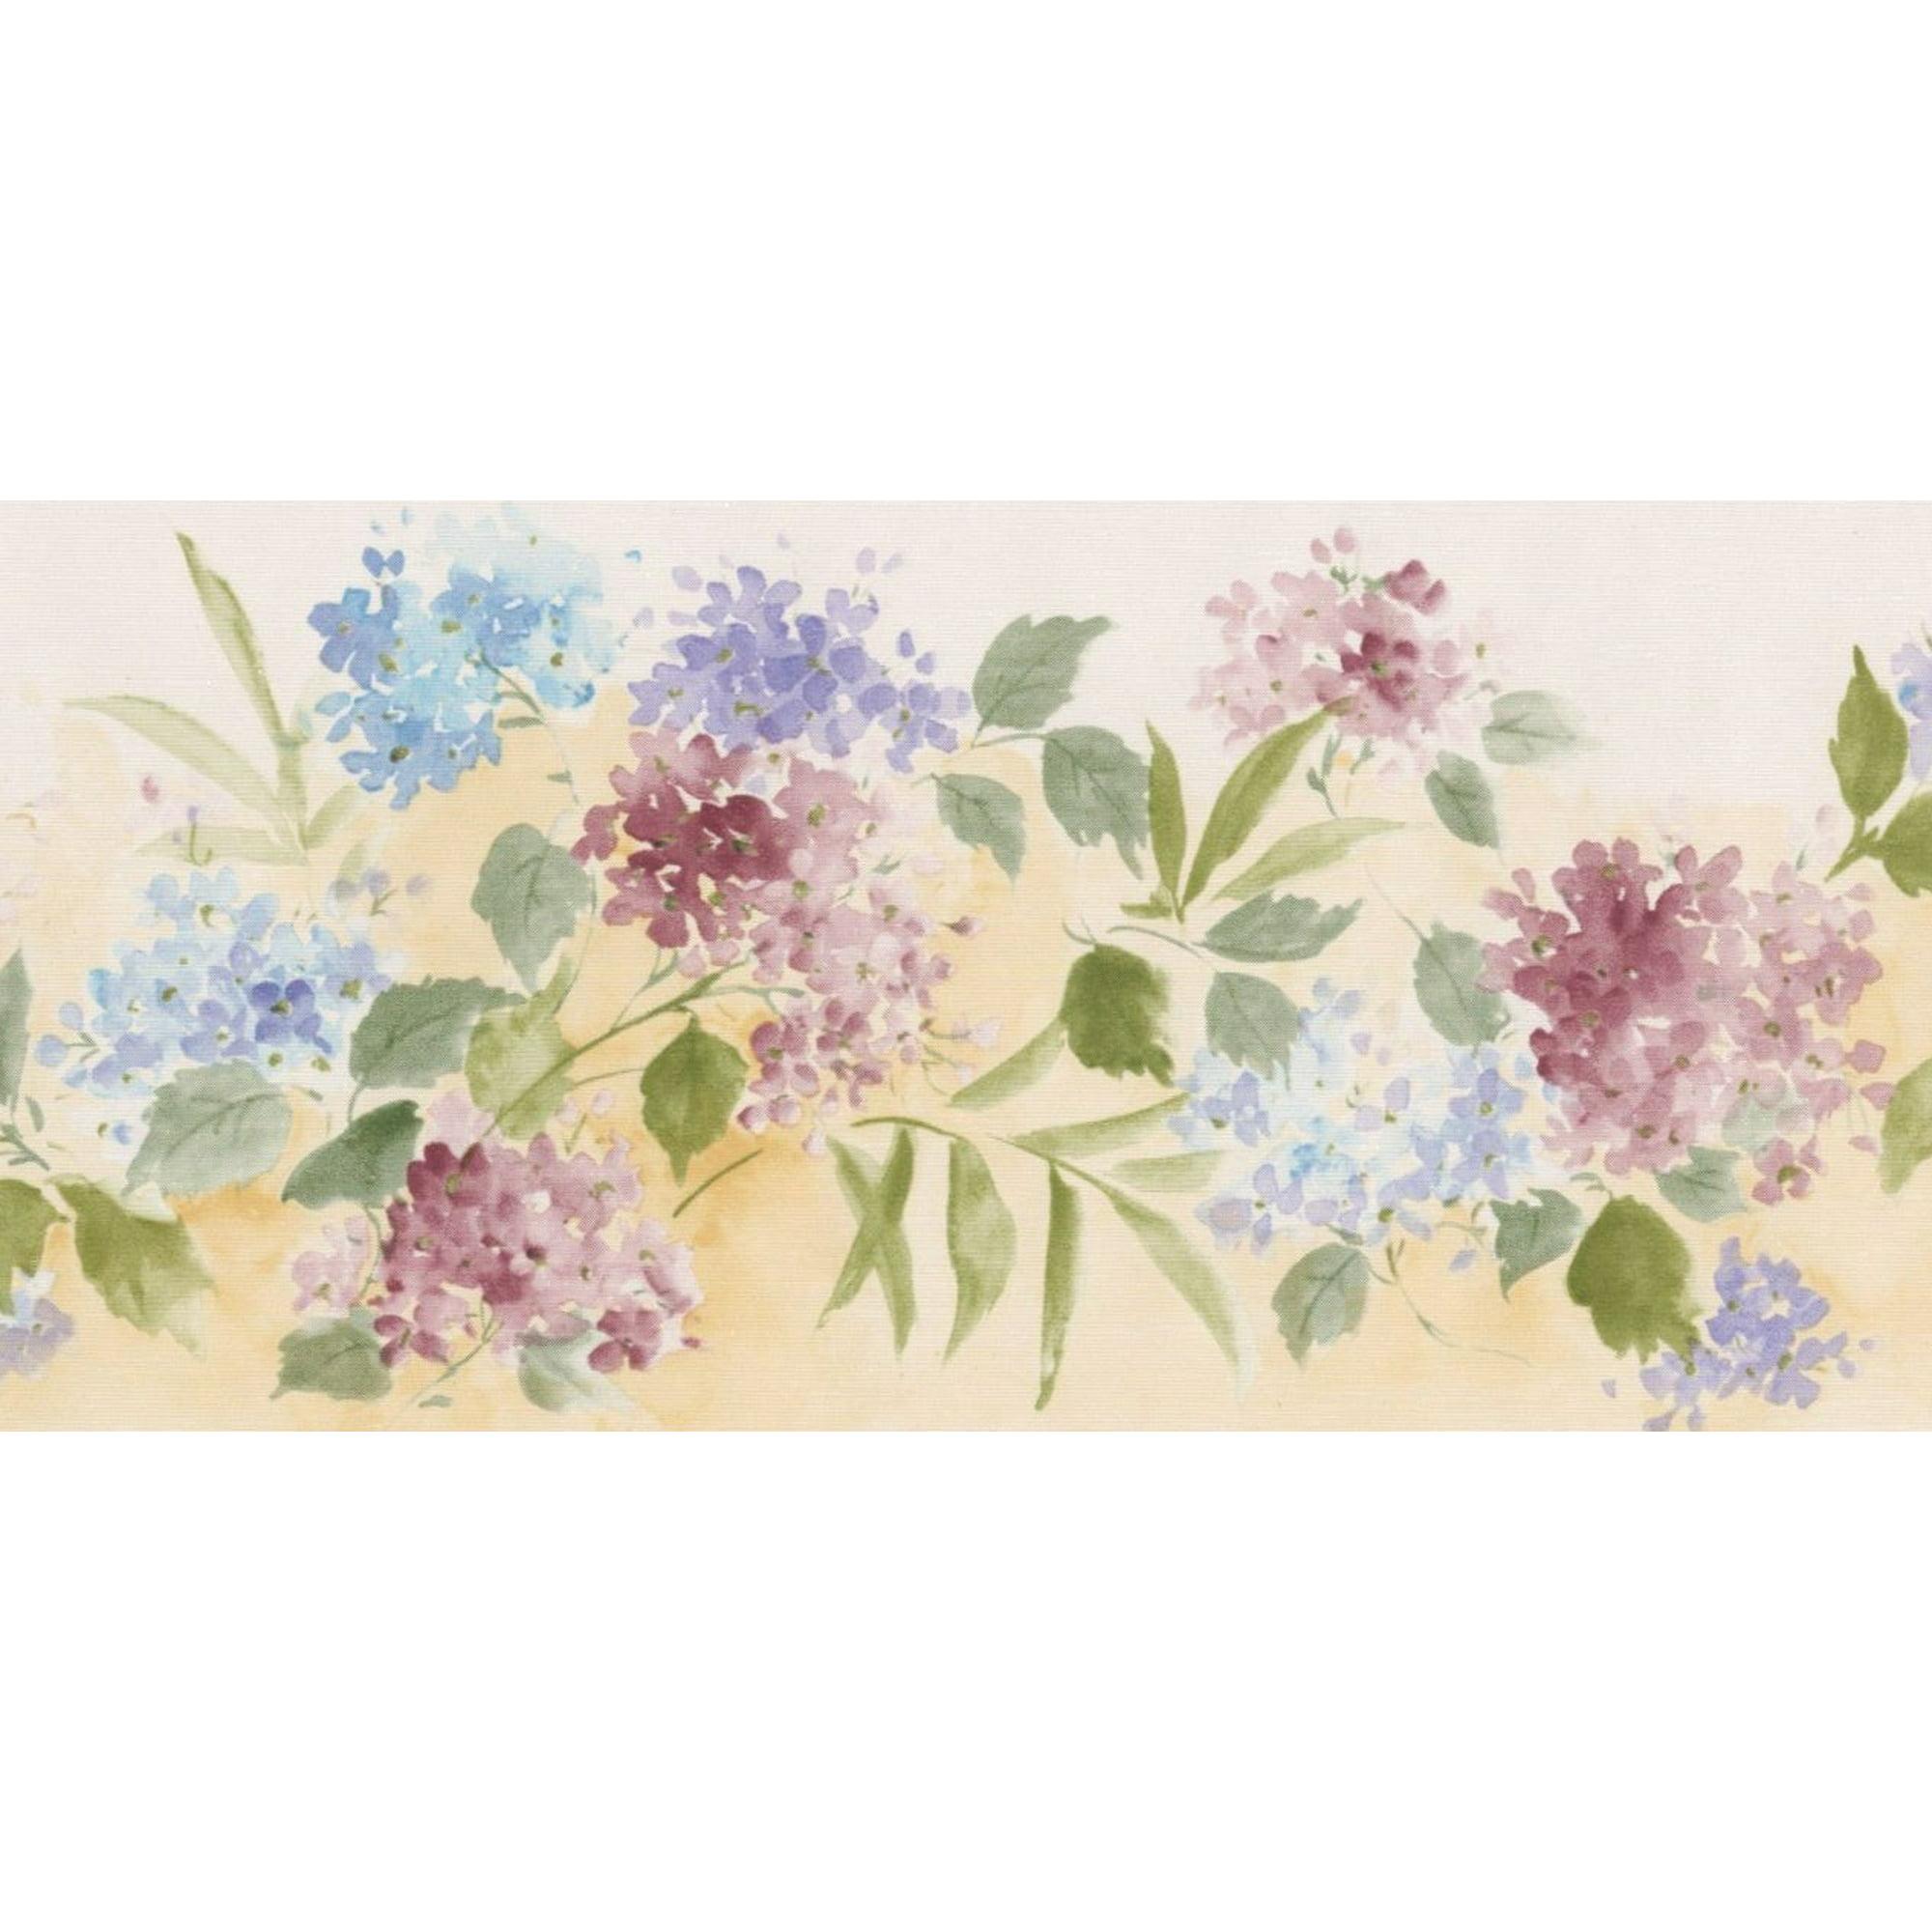 Pink Blue Flowers Floral Wallpaper Border Retro Design Roll 15 X